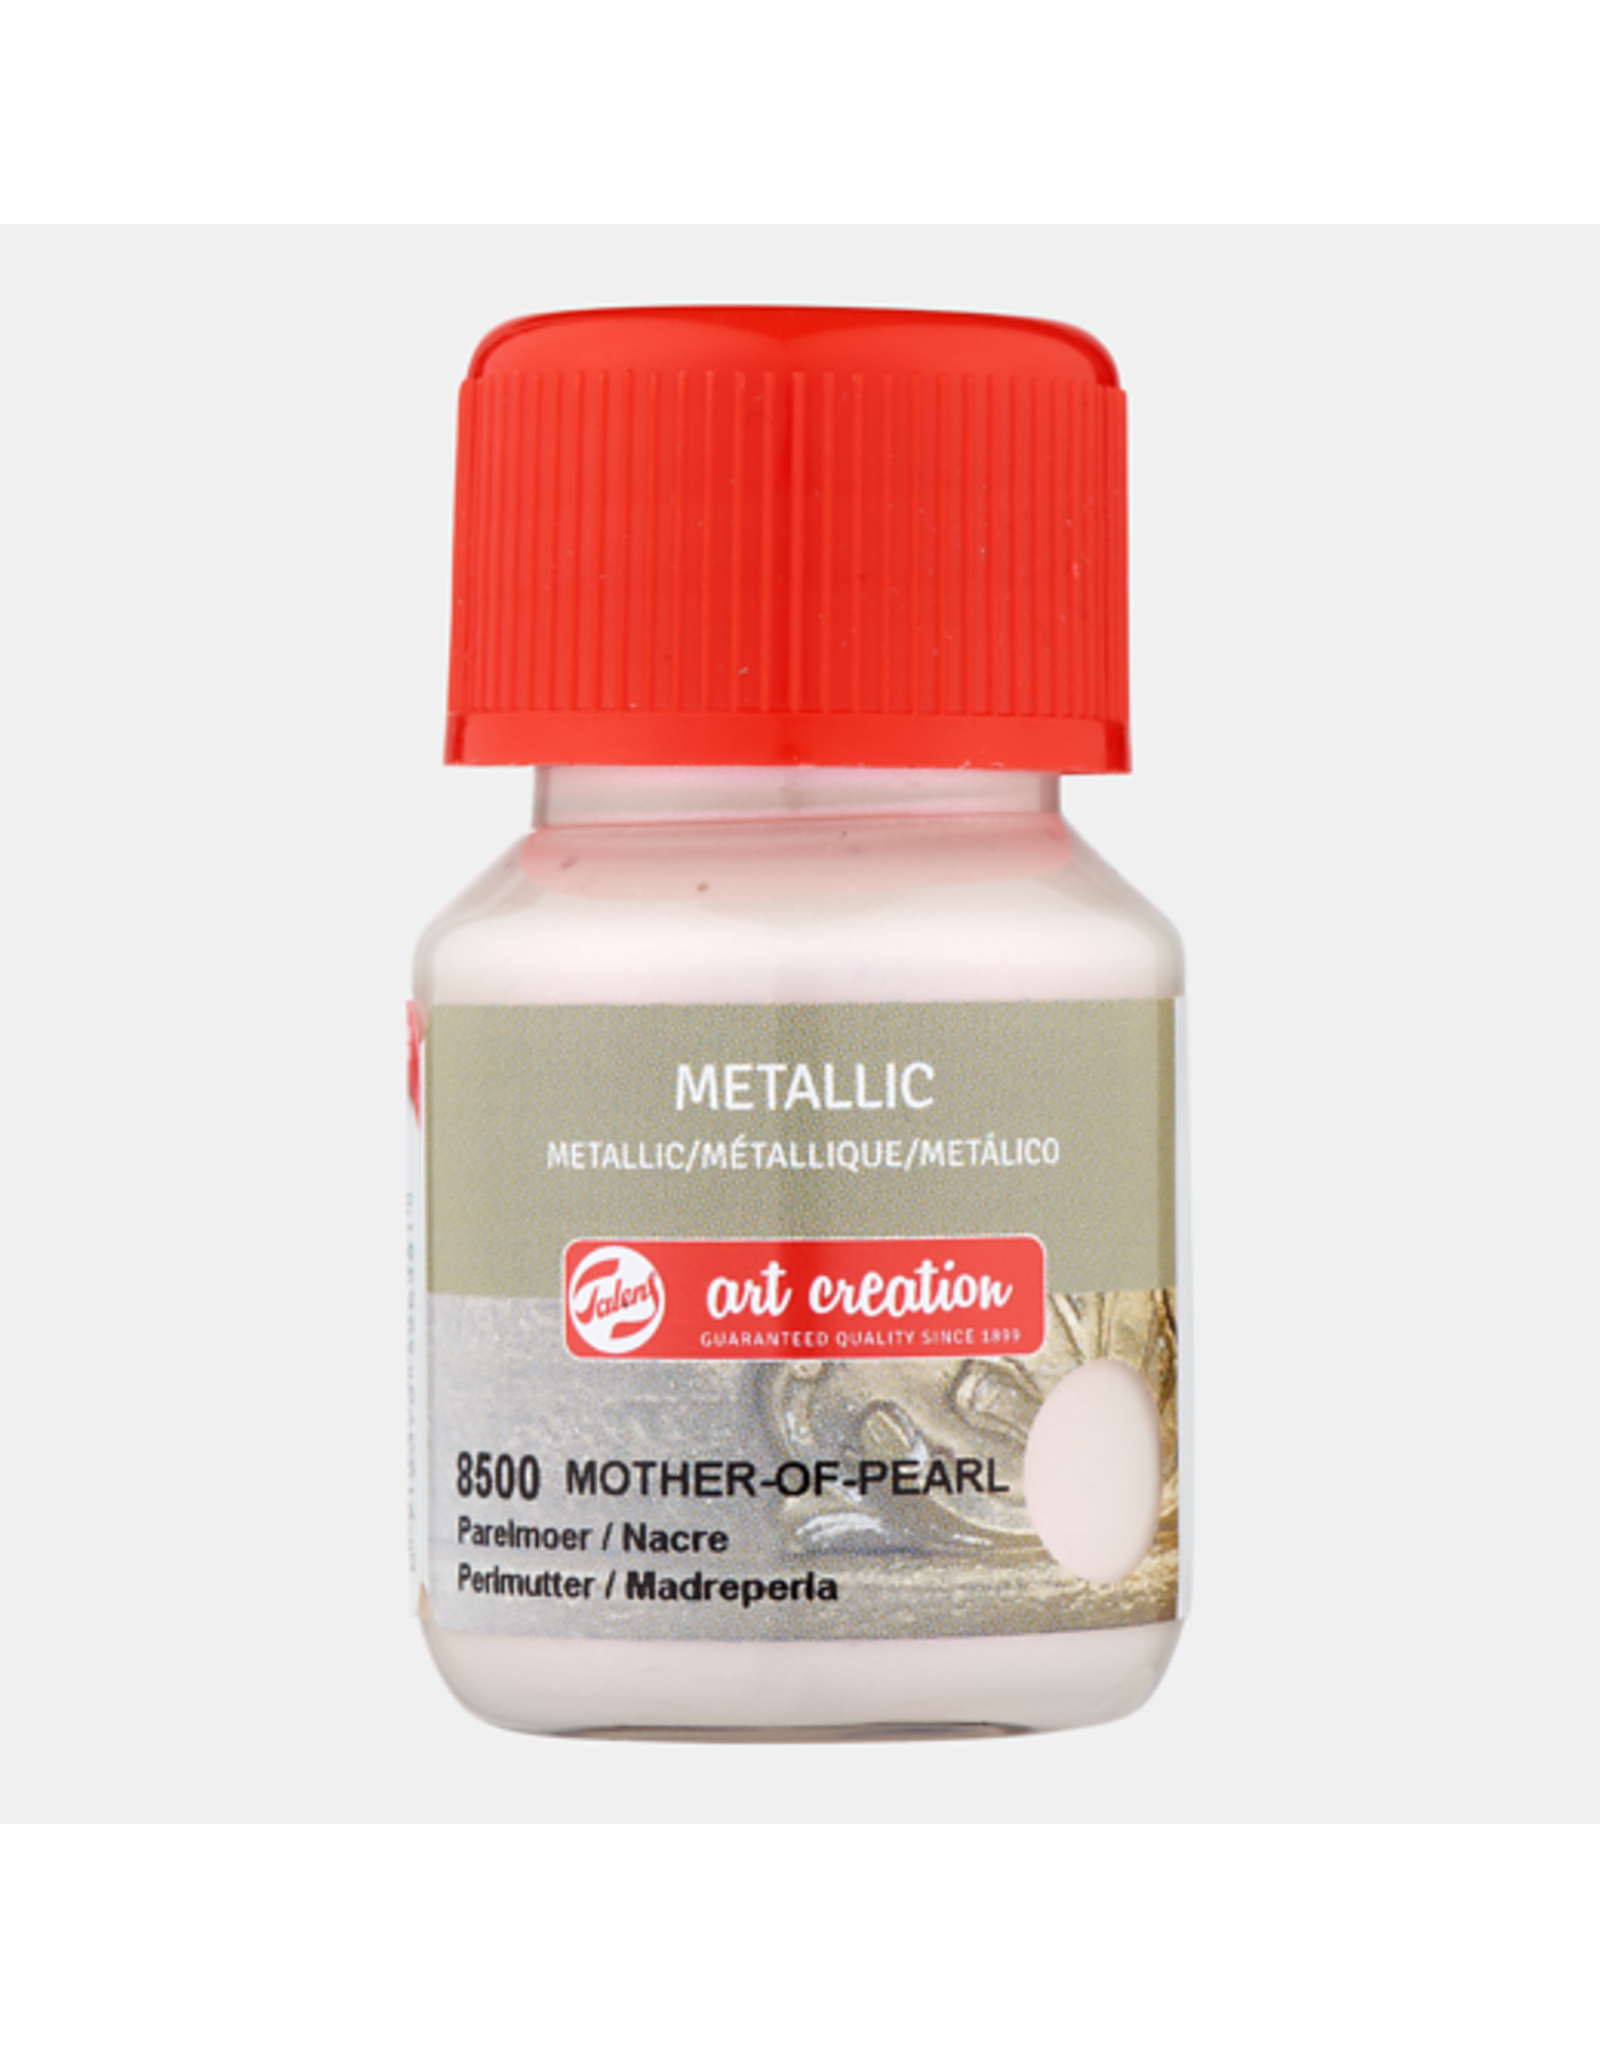 Art creation Parelmoer - Metallic - 30 ml